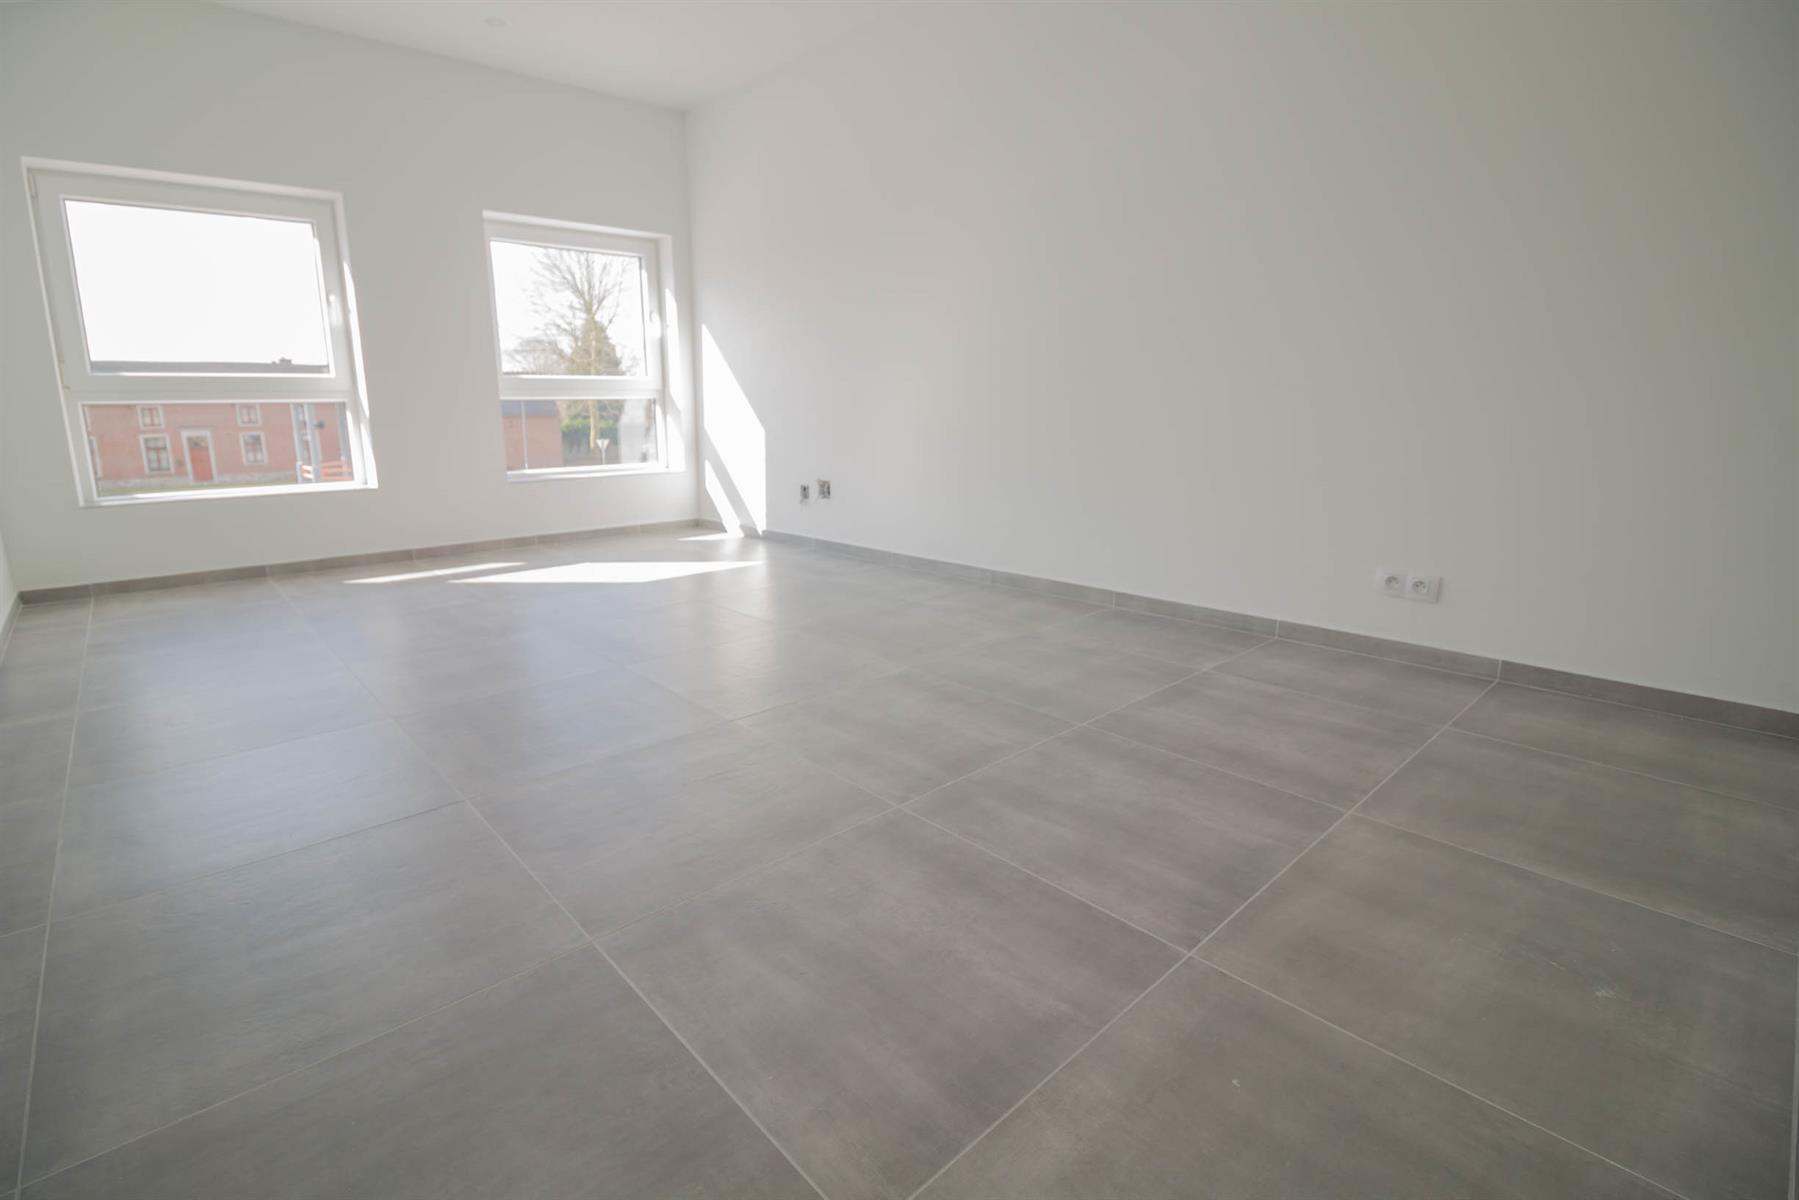 Appartement - Peissant - #4321179-12